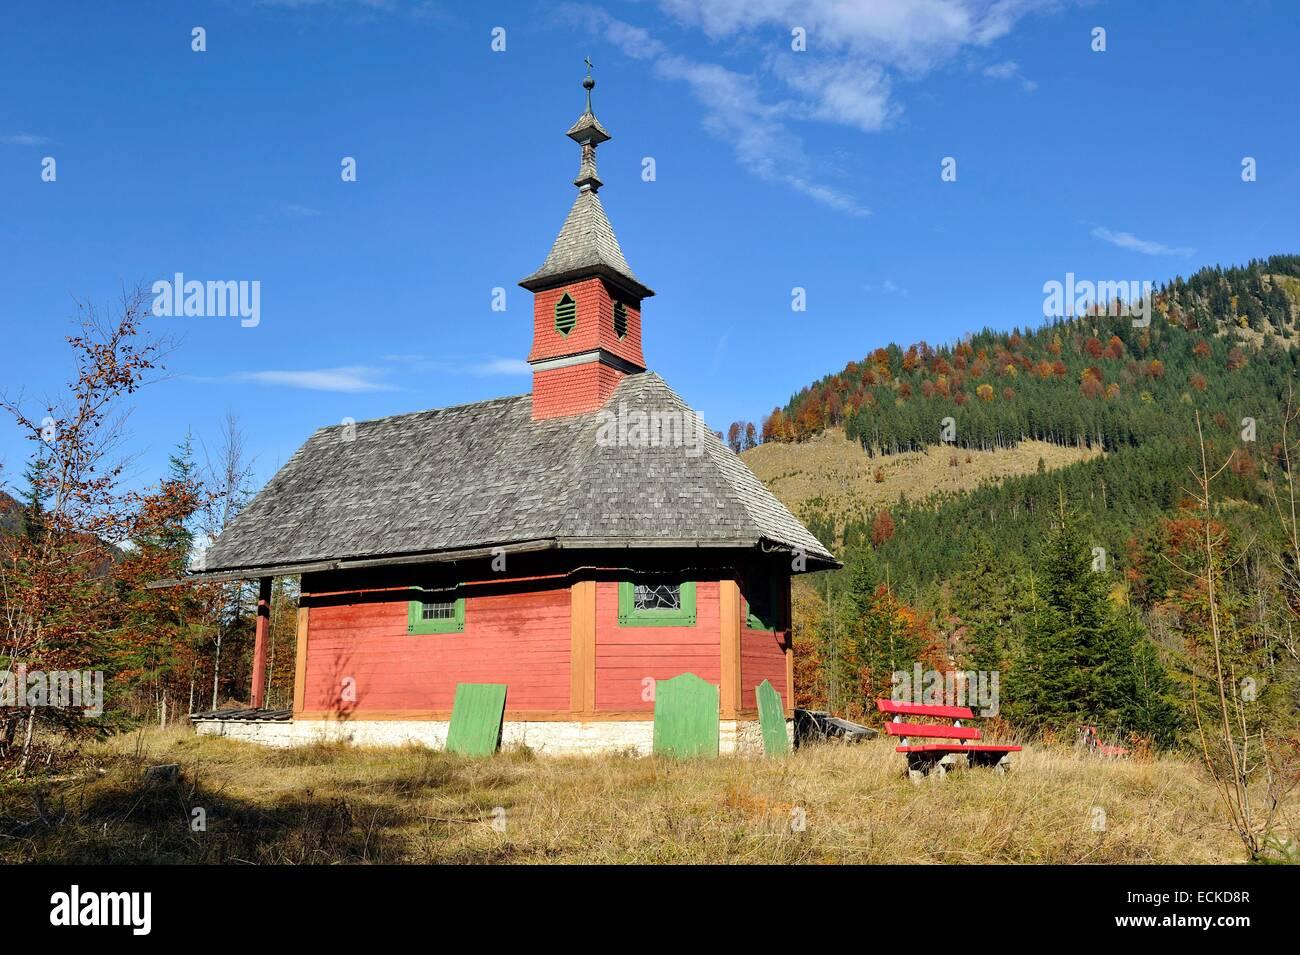 Austria, Tyrol, Karwendel, Grosser Ahornboden, EngTal, Hinterriss - Stock Image